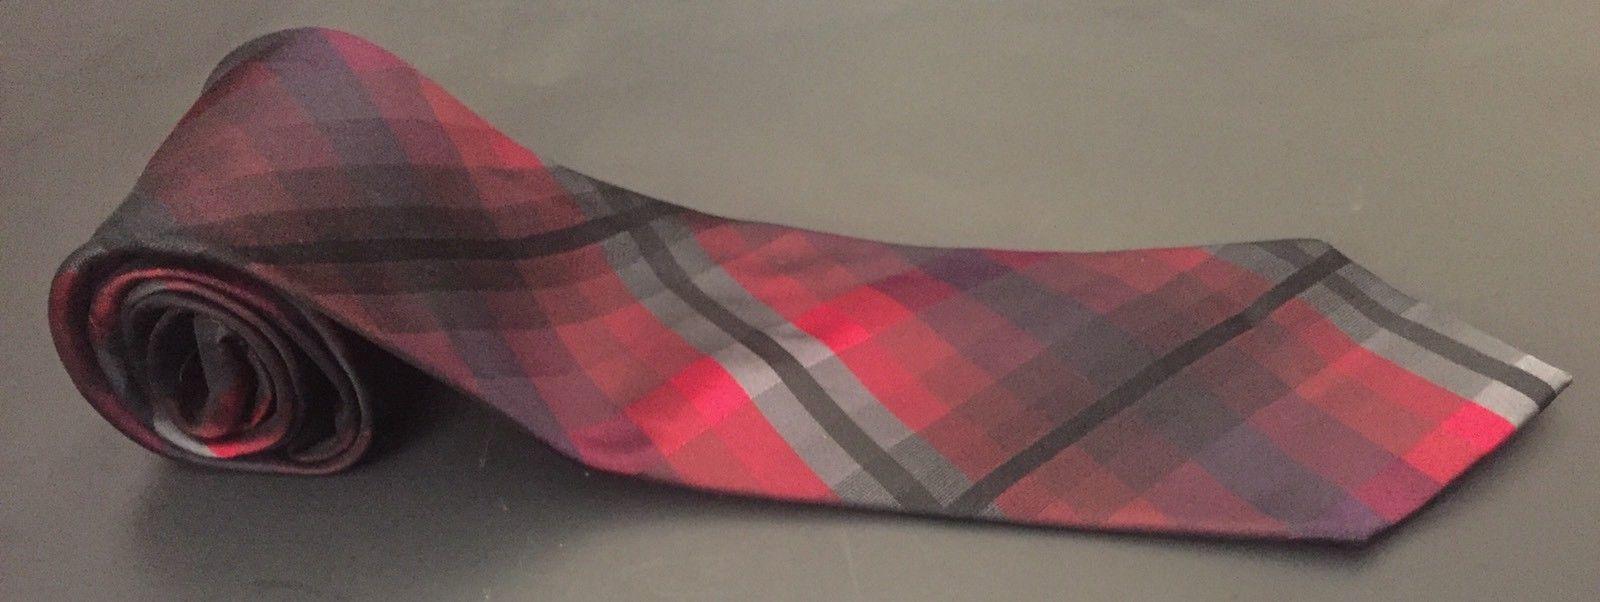 Kenneth Cole Reaction Tie Red Black Gray Cubed Plaid Preppy Necktie Neckwear